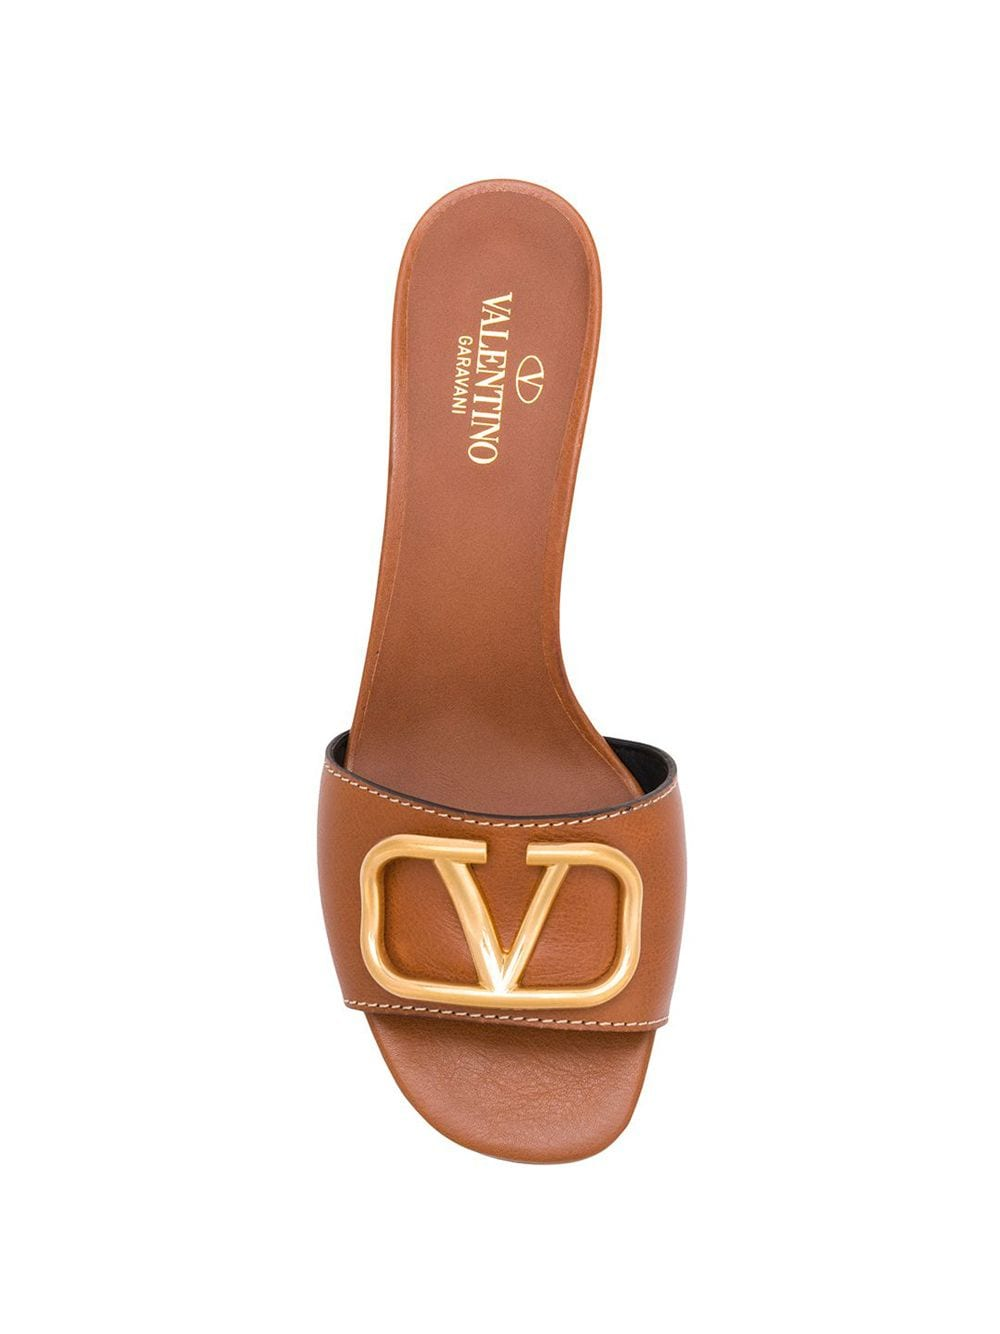 VALENTINO | мюли Valentino Garavani с логотипом Go Logo | Clouty